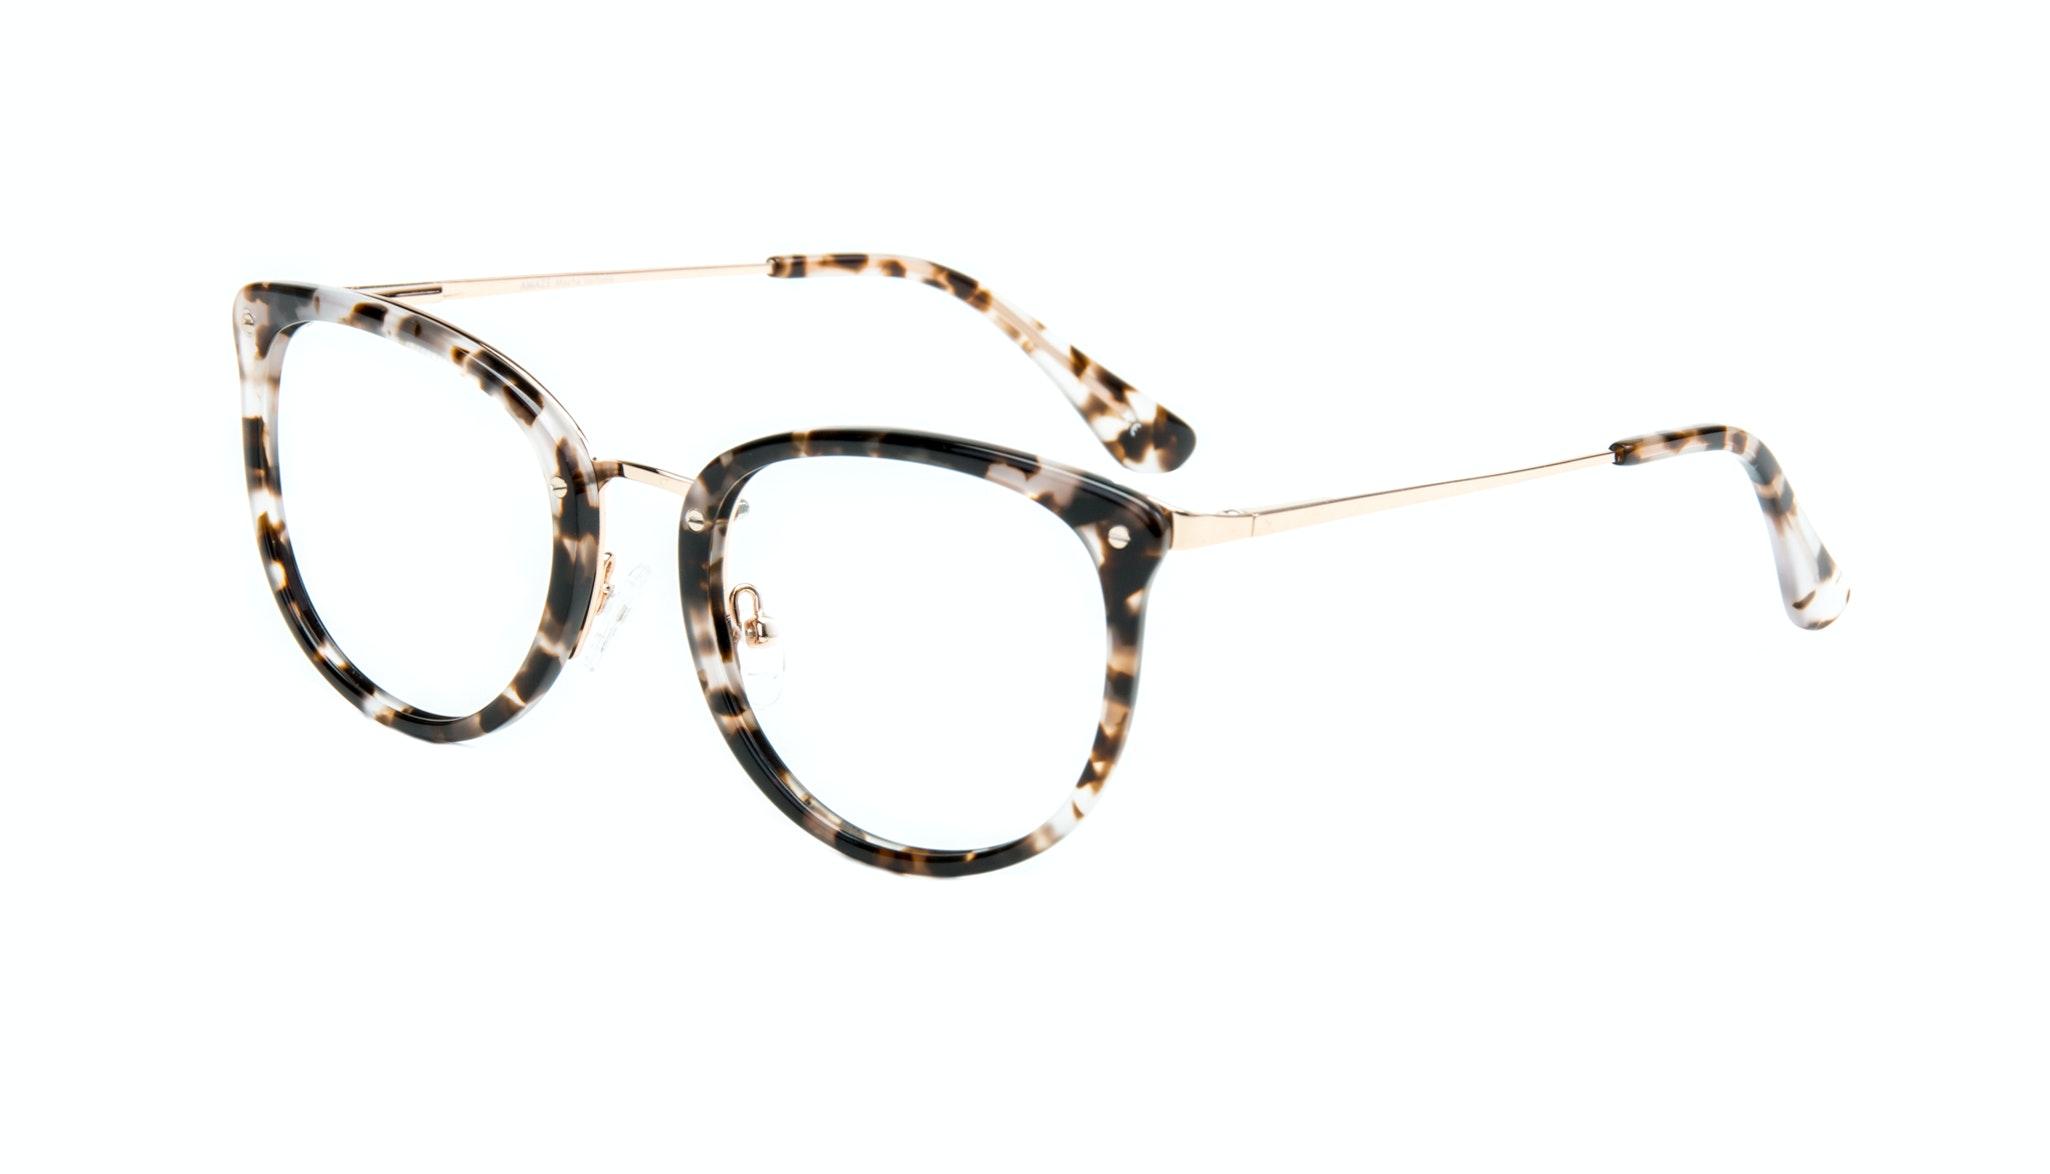 Affordable Fashion Glasses Square Round Eyeglasses Women Amaze Mocha Tortoise Tilt